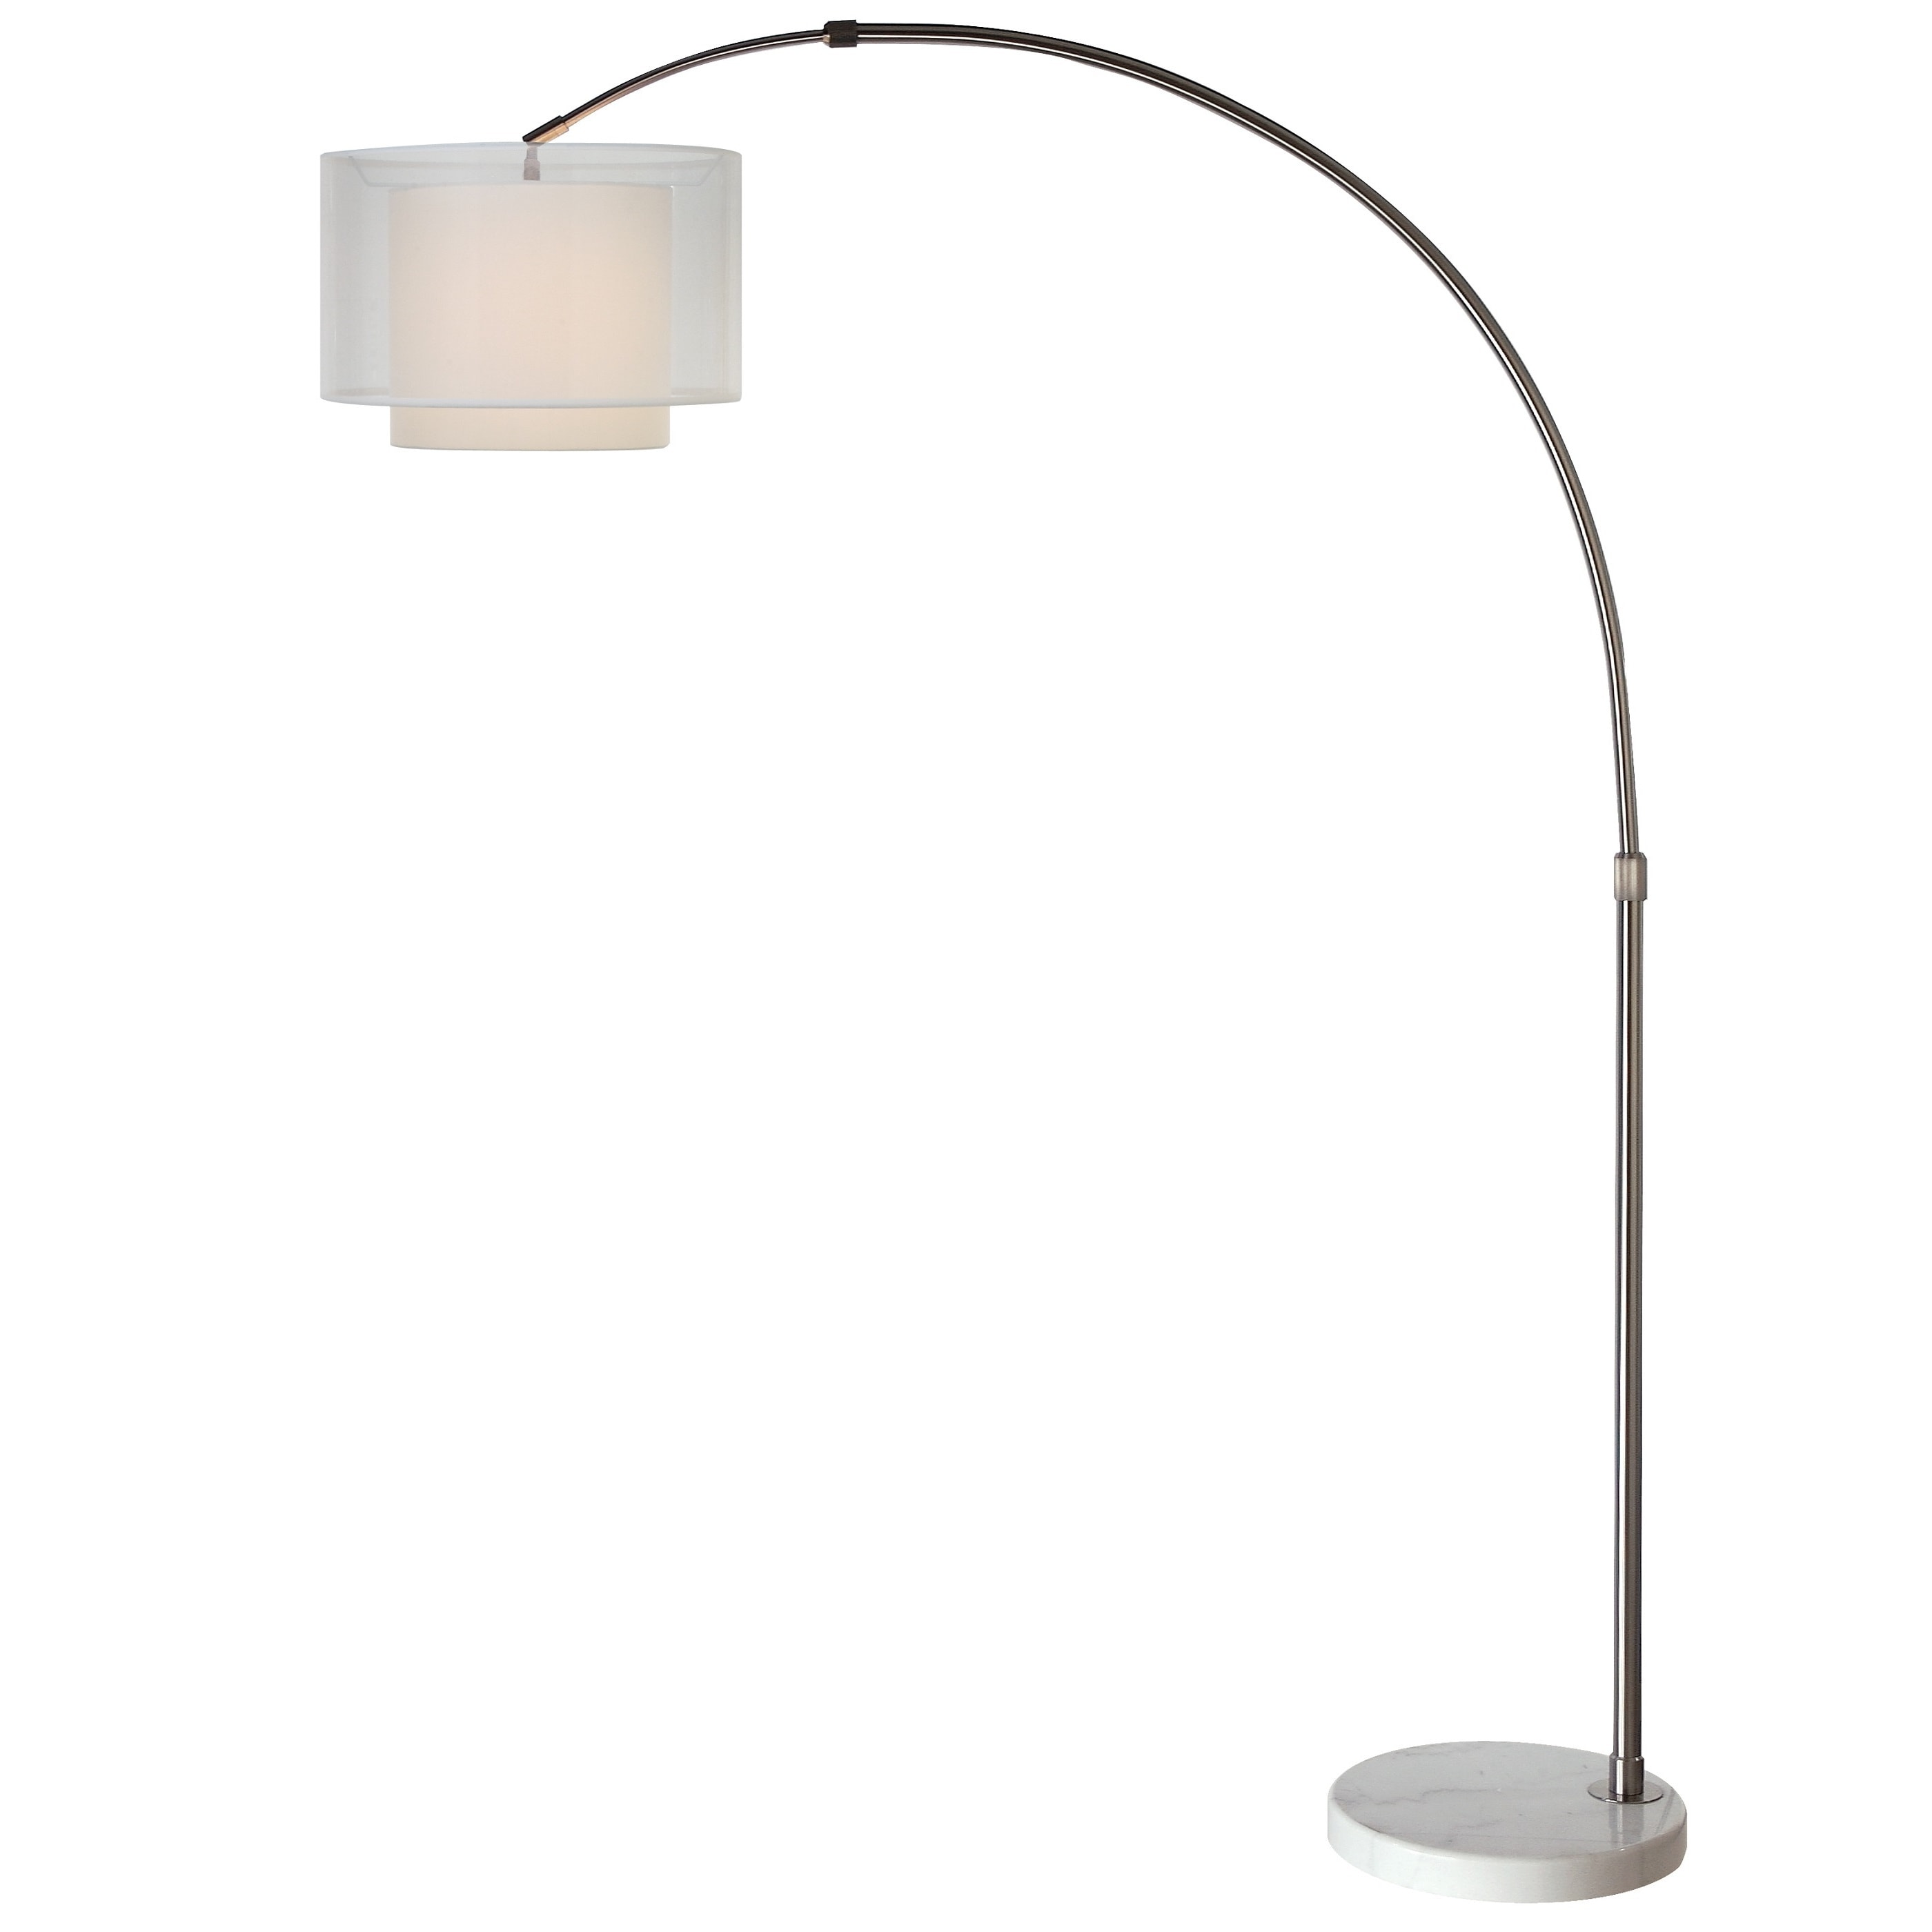 Brella 1 Light Brushed Nickel Arc Floor Lamp